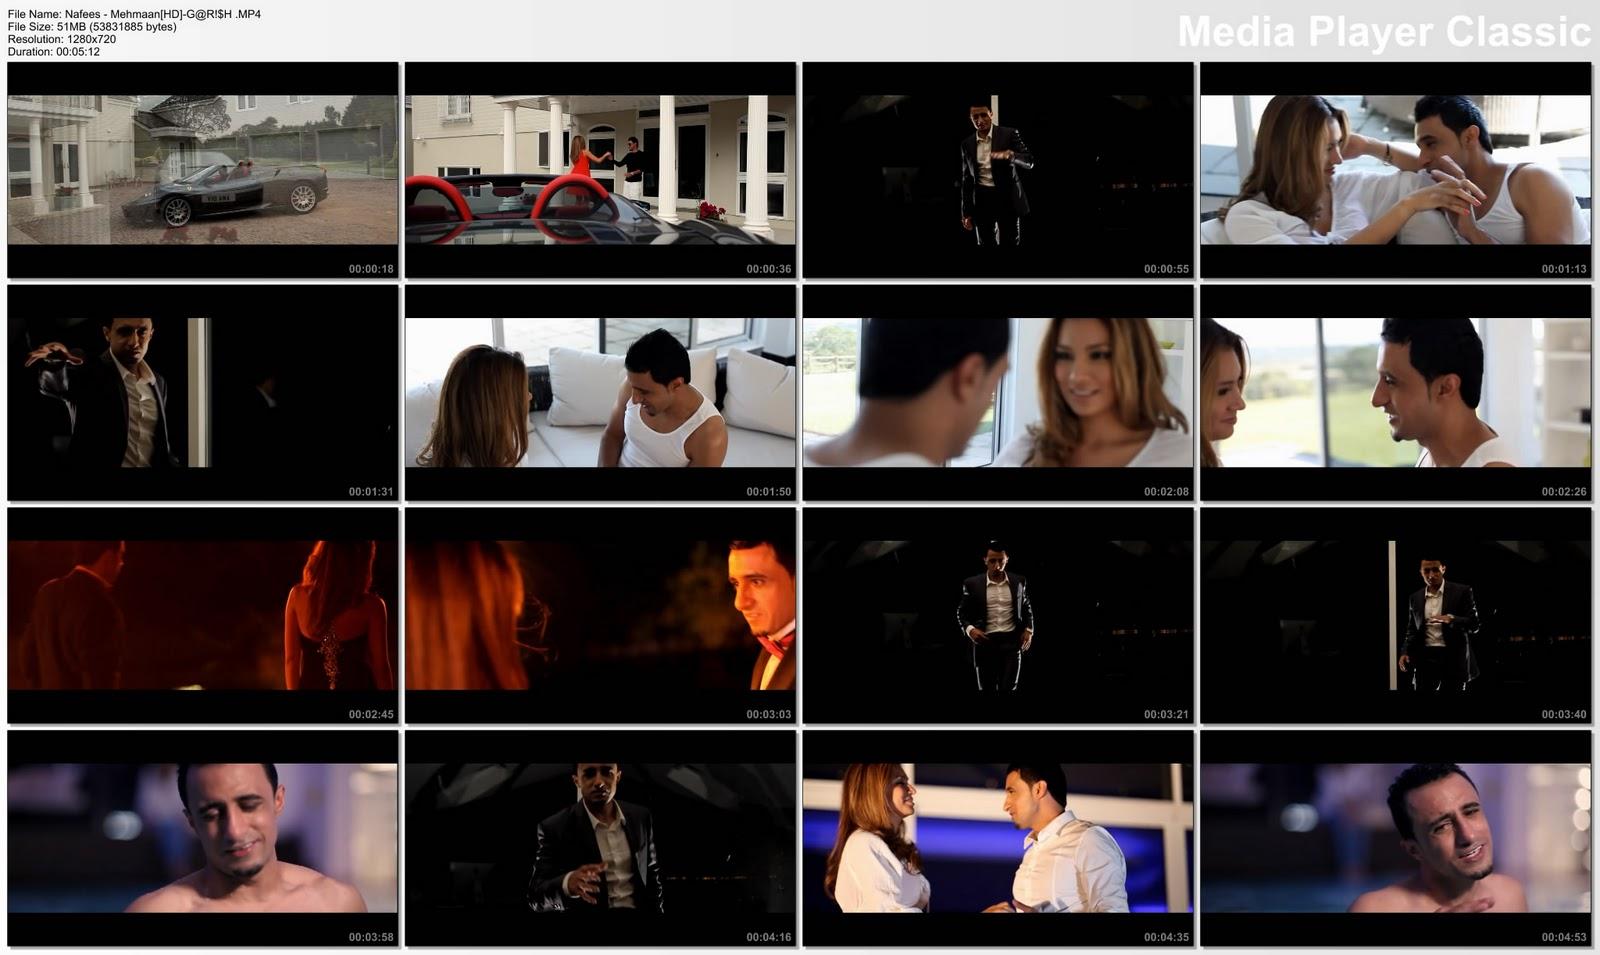 Nafees - Mehmaan [HD-720p]-{Mobicareg}